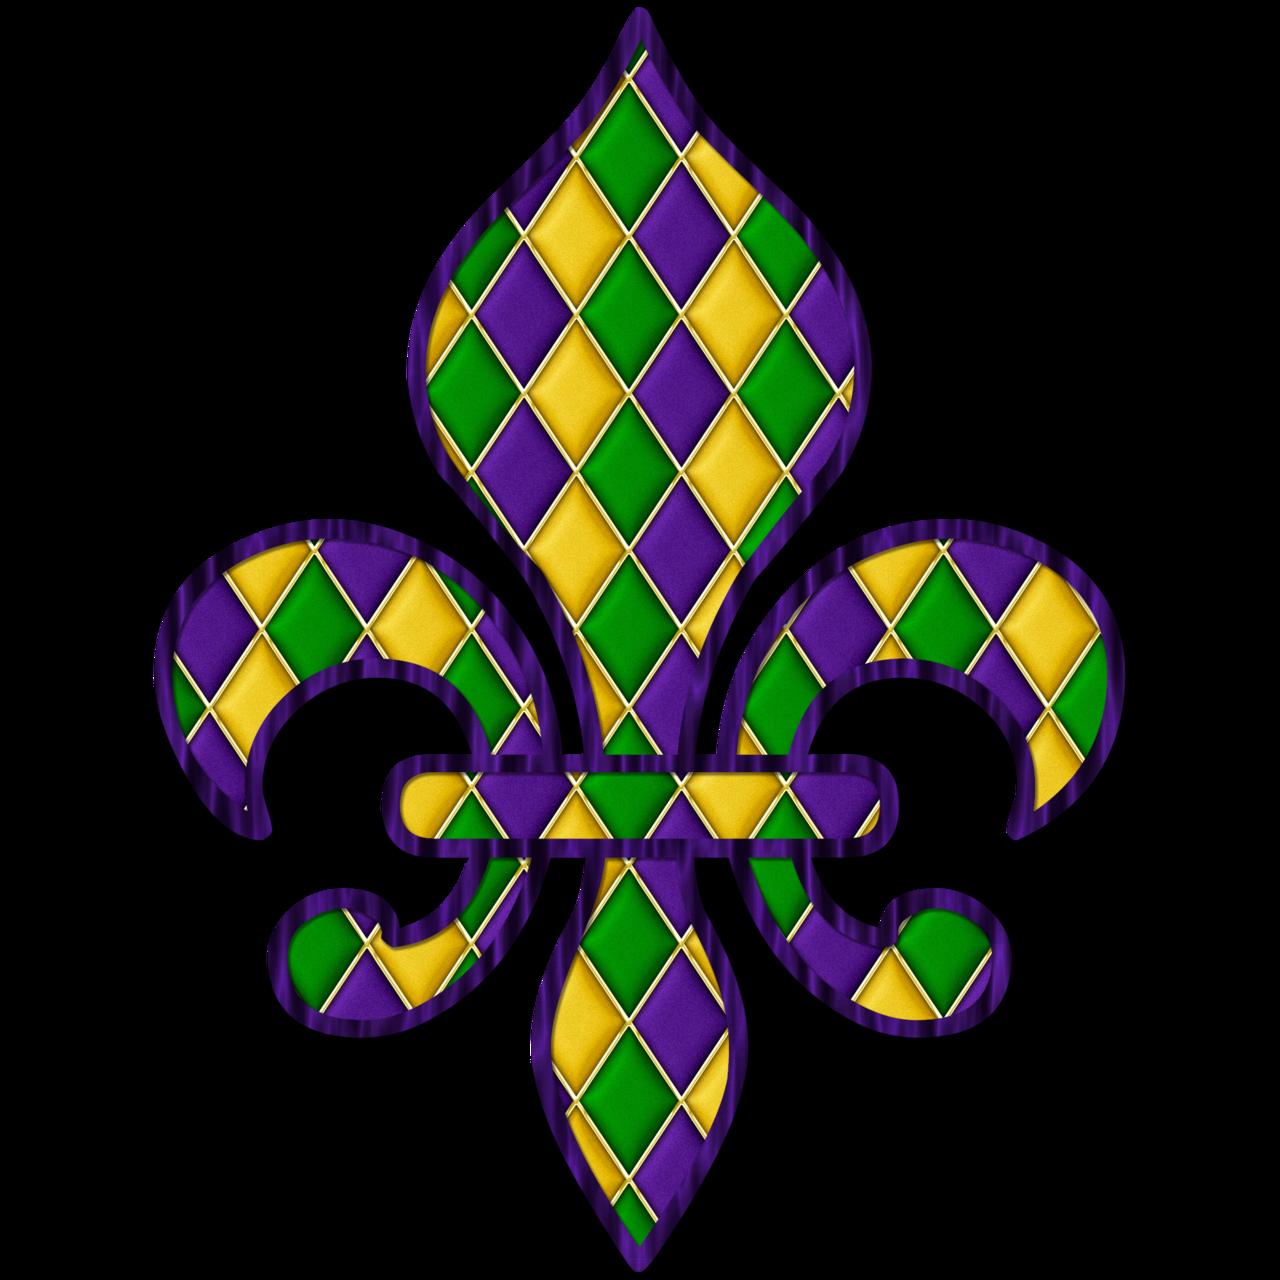 Mardi Gras Beads Clipart - Clipart Kid